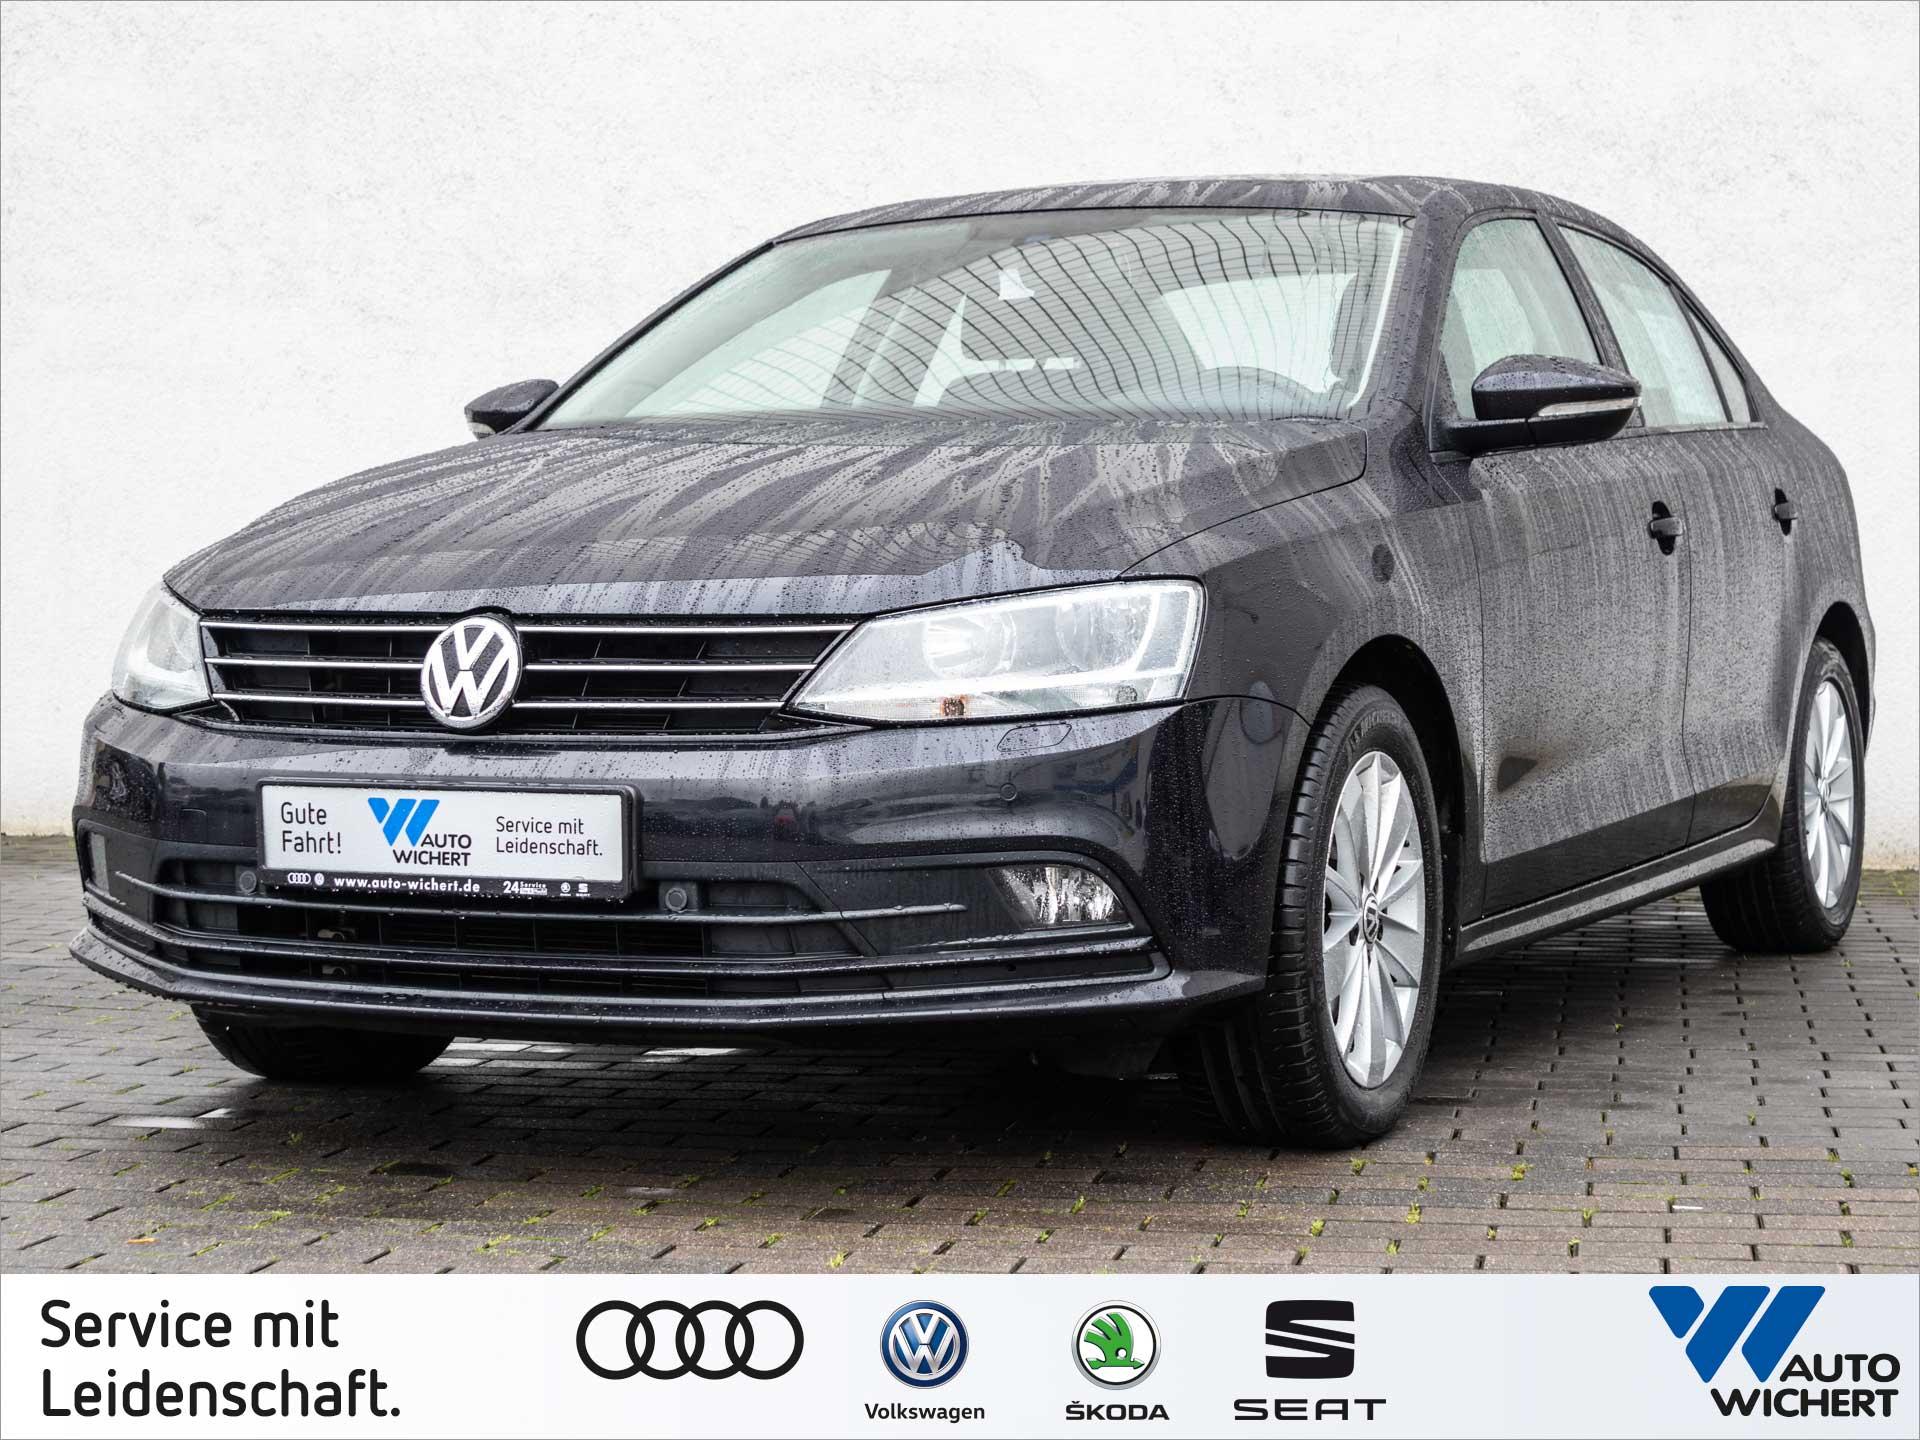 Volkswagen Jetta Comfortline 1.4 TSI 6-Gang CLIMATRONIC/ SD, Jahr 2015, Benzin